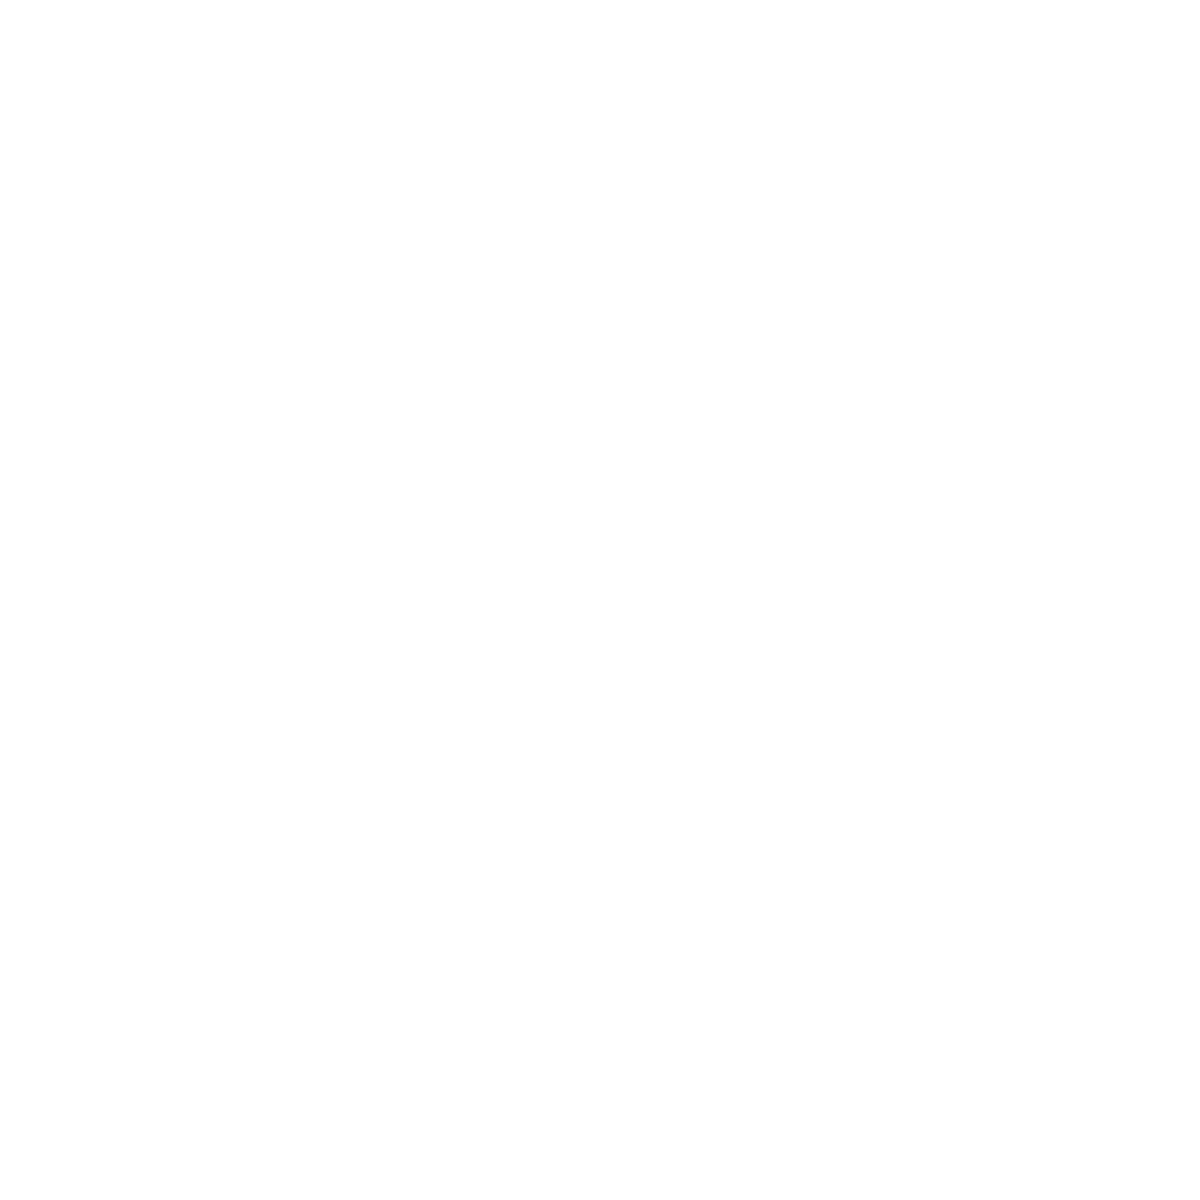 noun_books_550274_FFFFFF